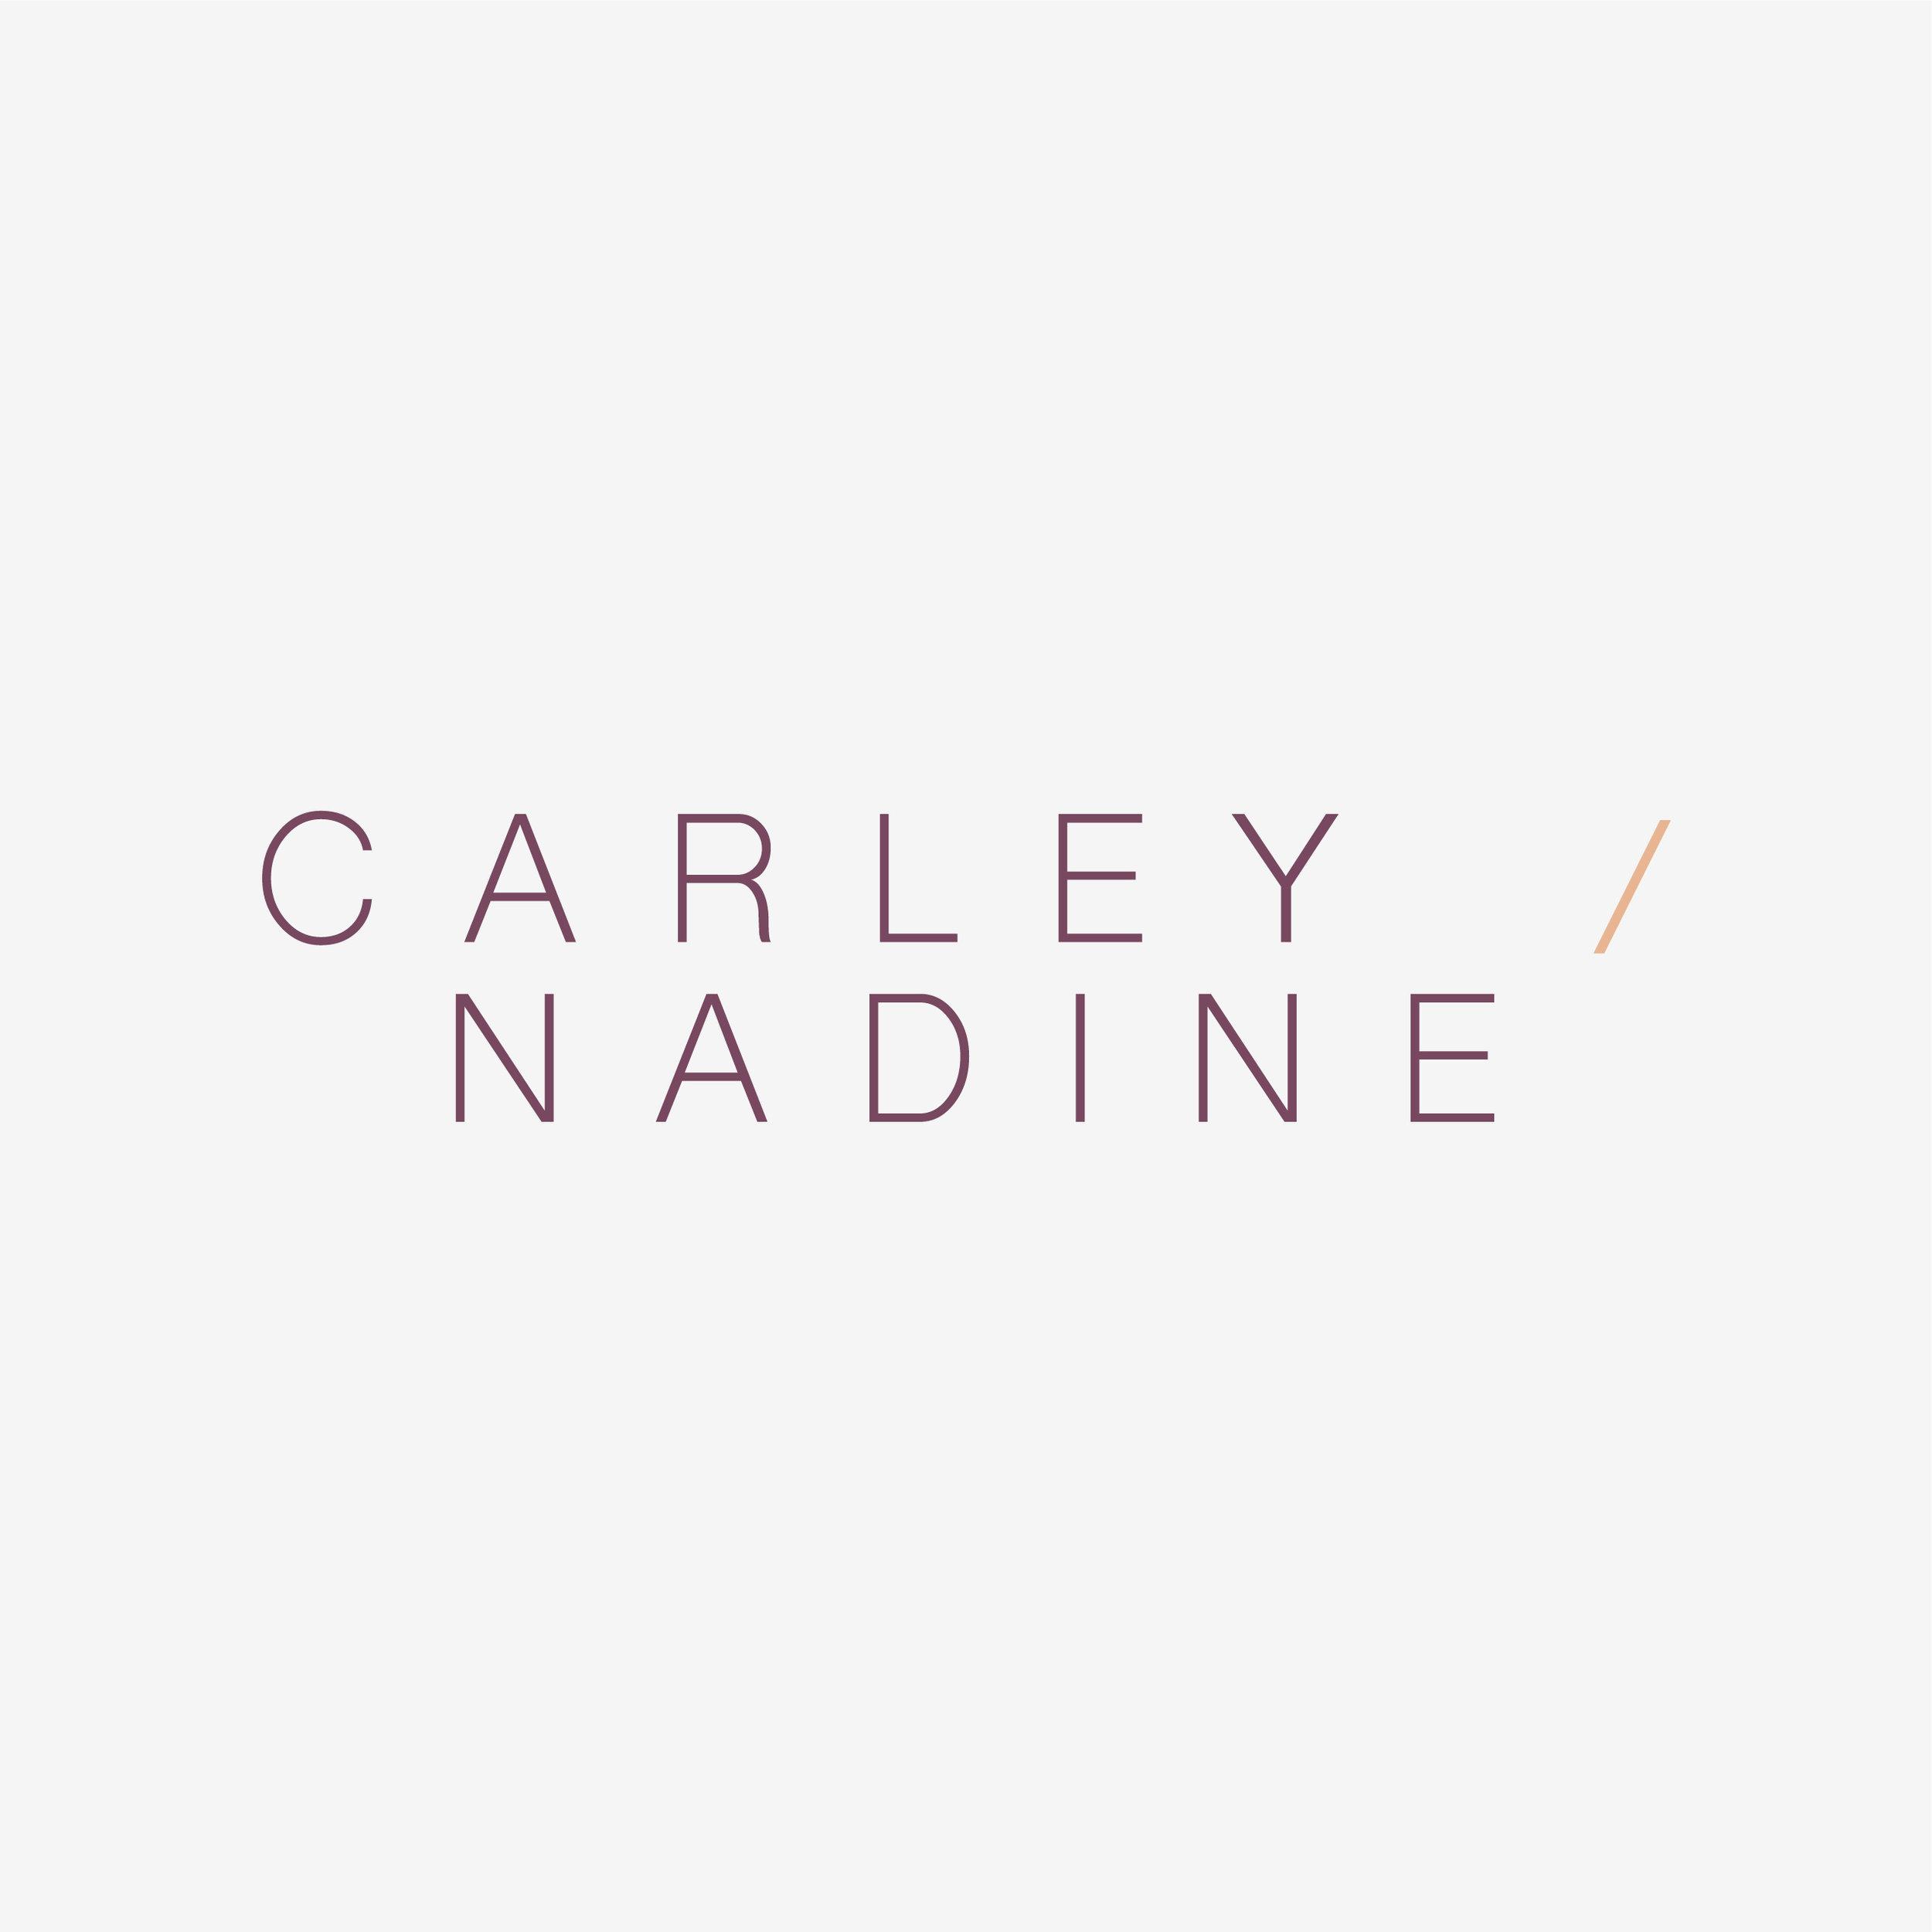 Carley-Nadine-brand.jpg